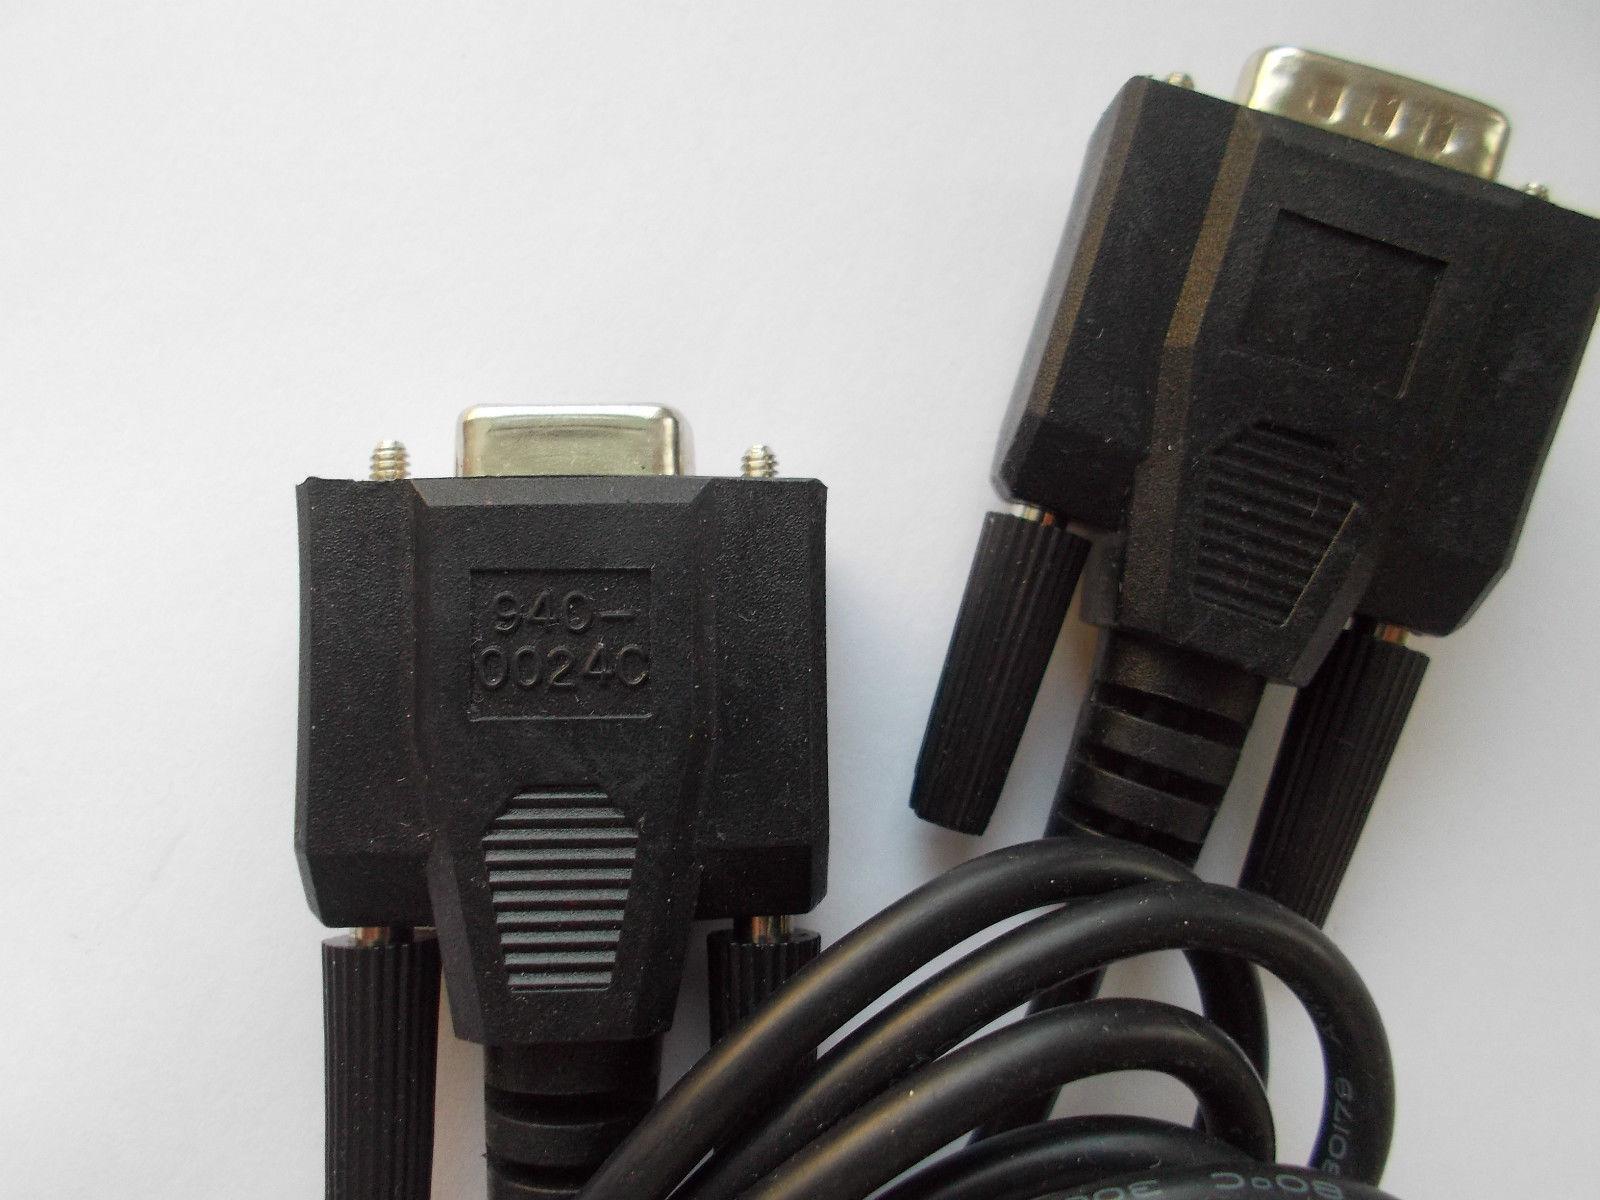 original NEW 2 meter data cabel APC 940-0024C smart DB9M-DB9F - $10.00